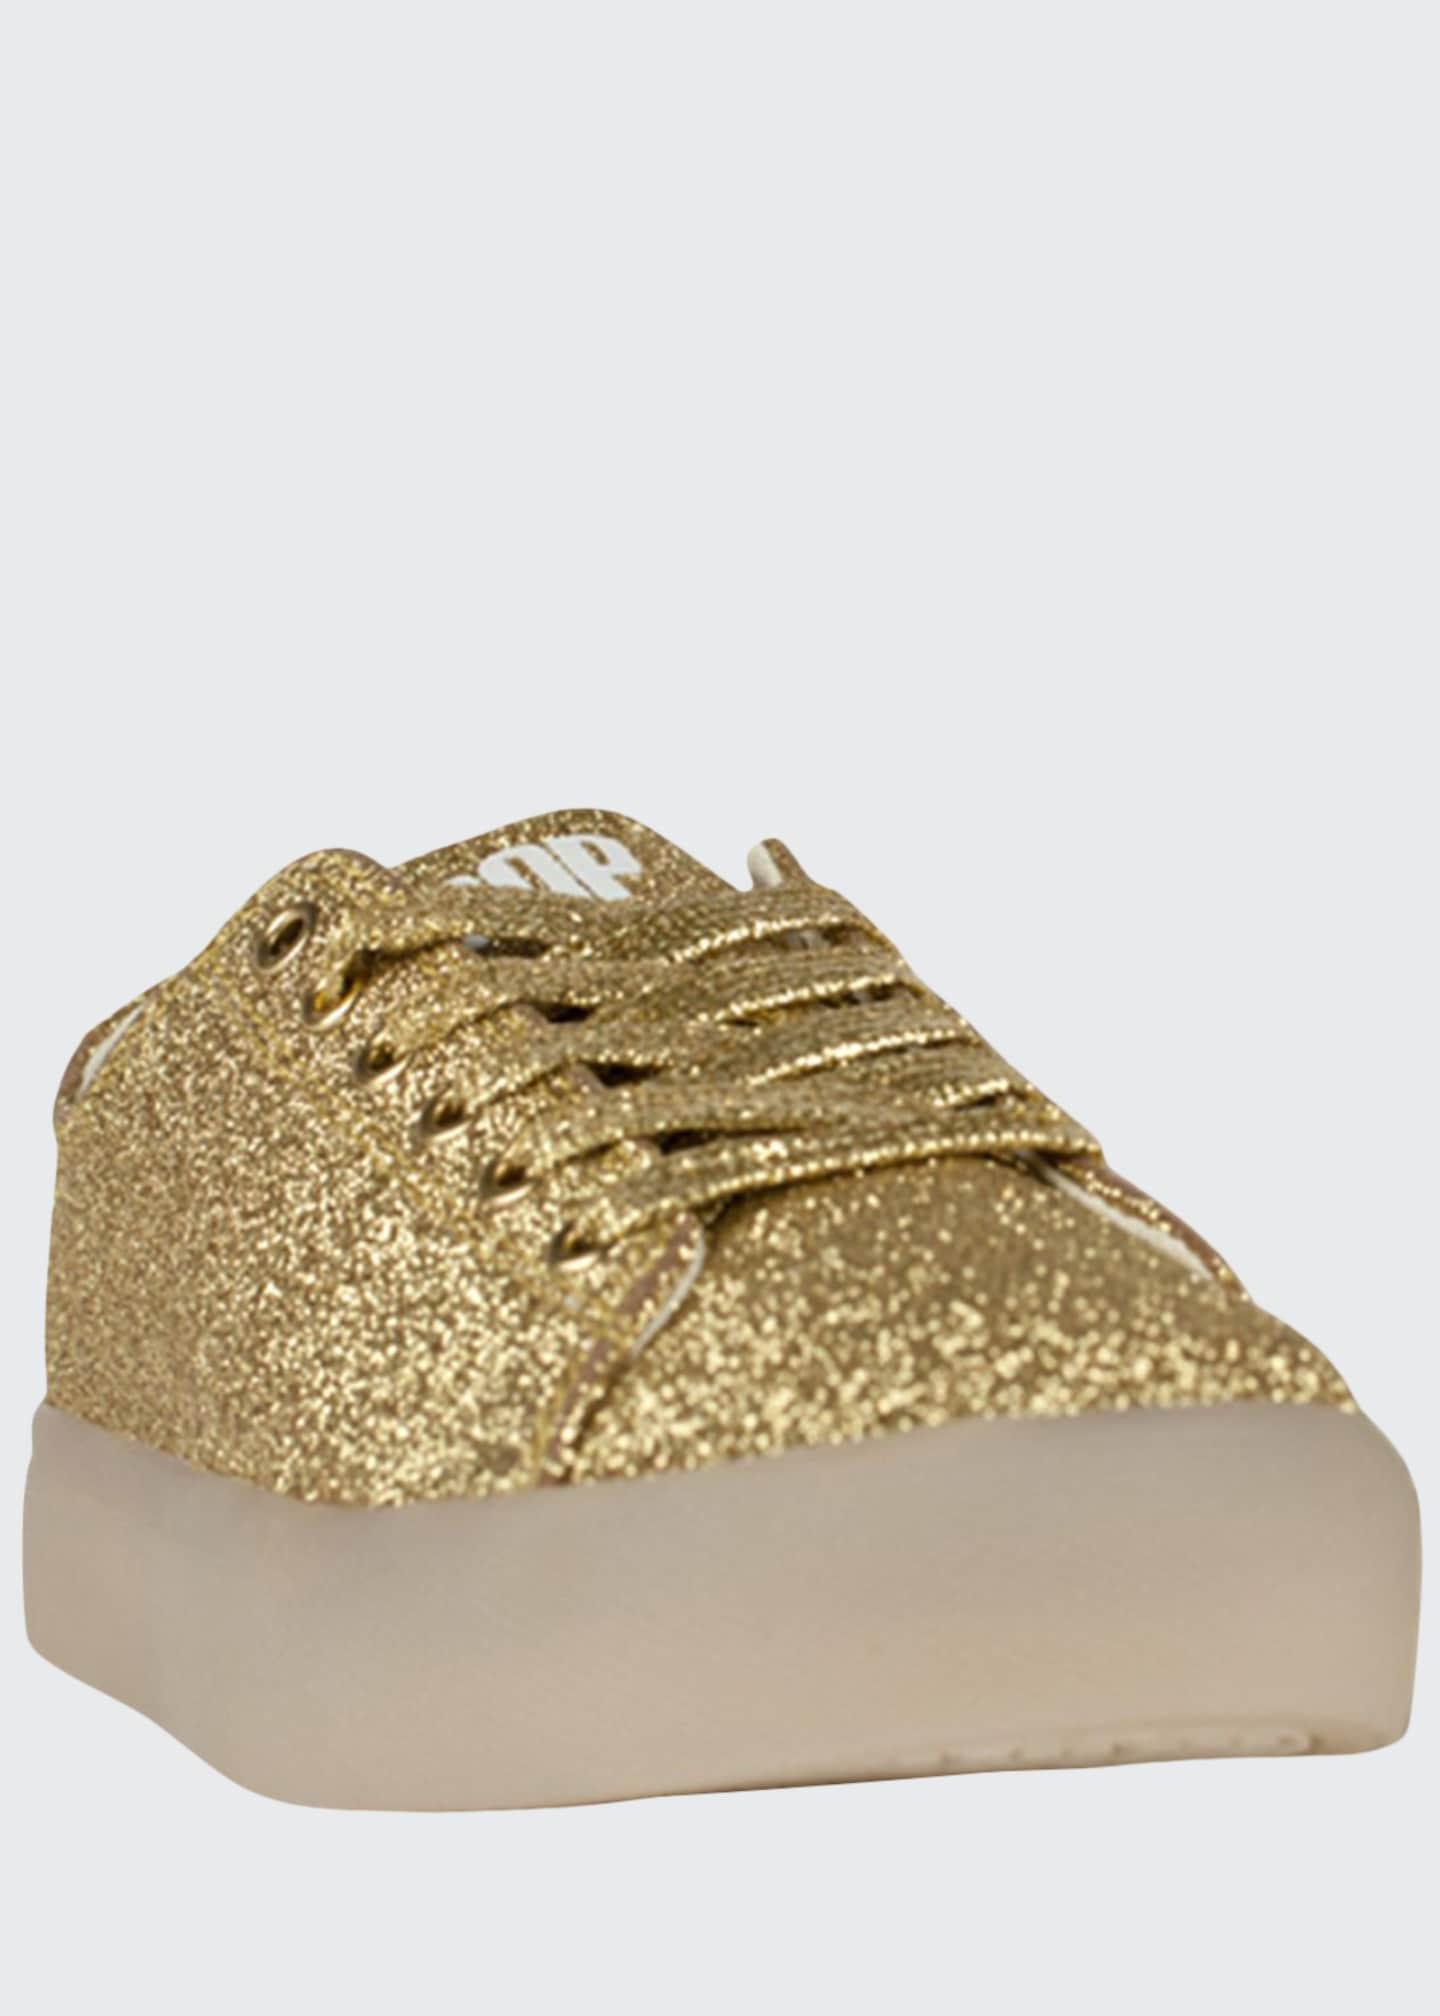 Pop Shoes EZ Glitter Light-Up Sneakers, Toddler/Kids